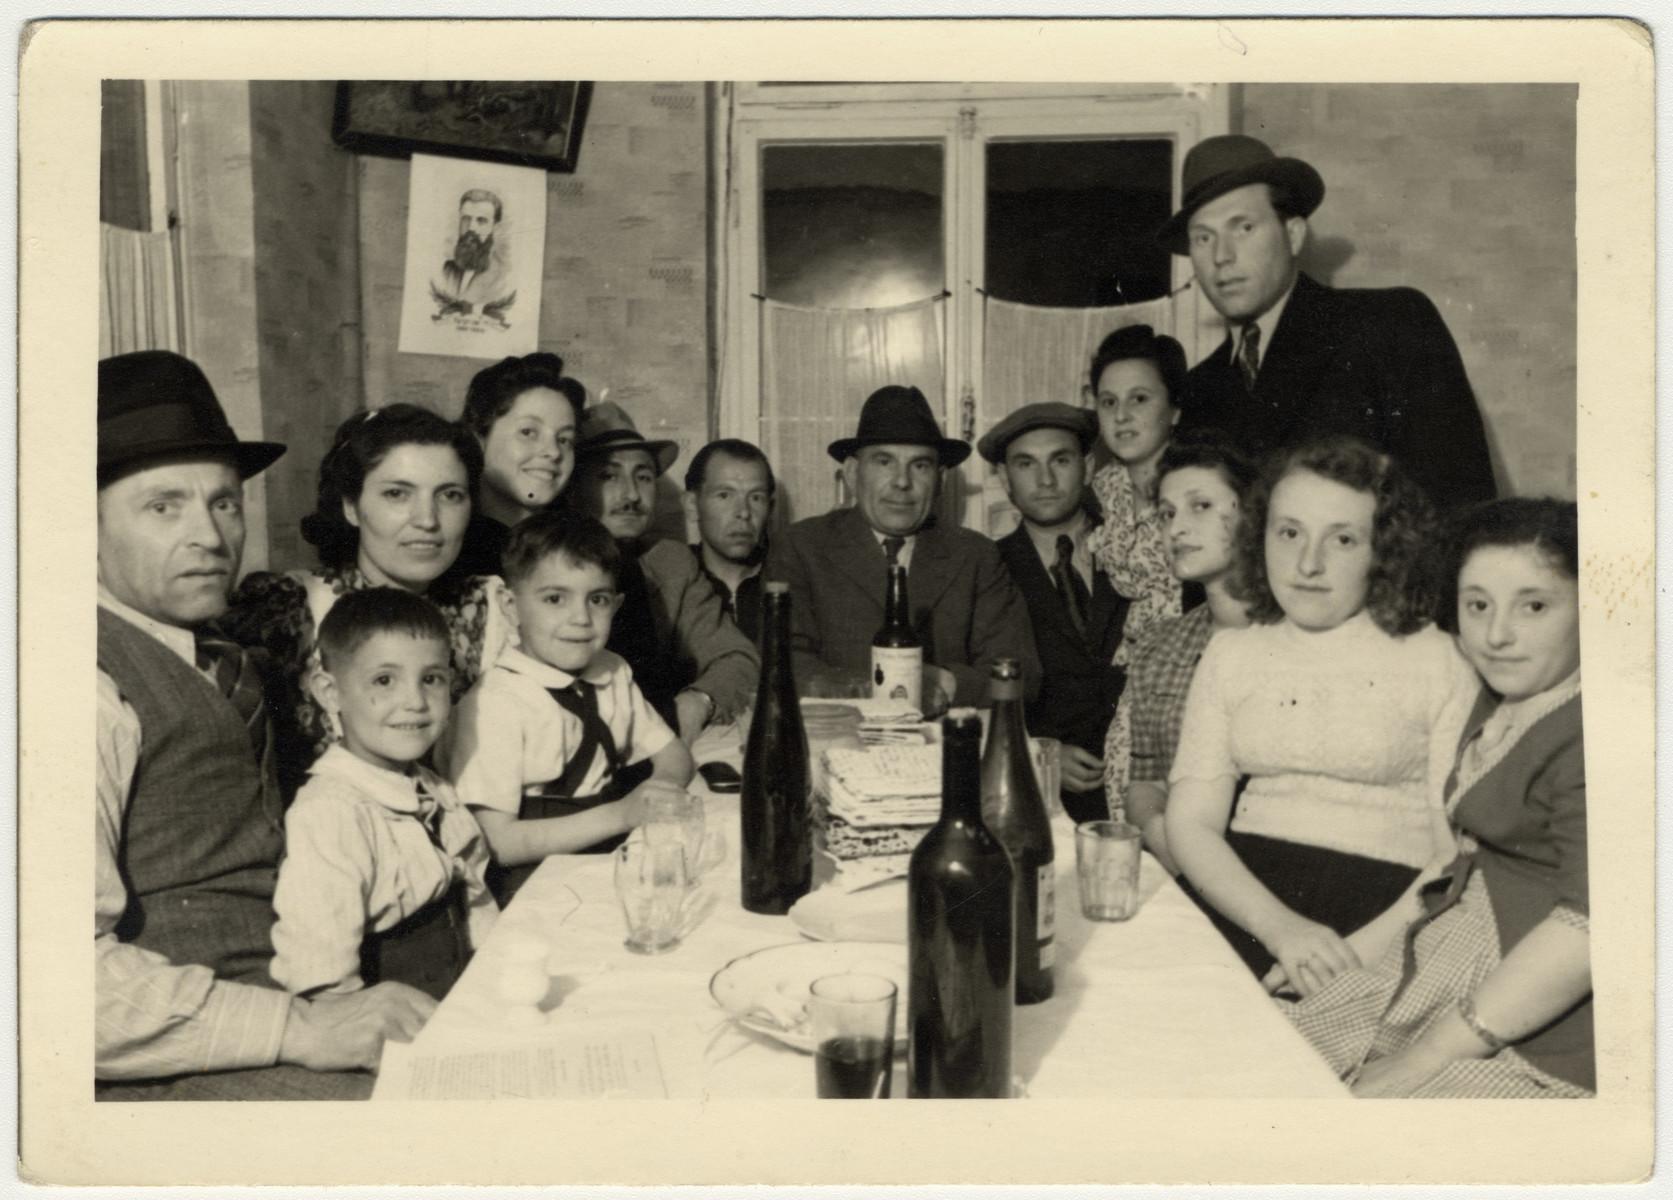 Former Zhetel partisans celebrate their first Passover following their liberation.  Picture from left to right are Shlamke Minuskin, Kalman Minuskin, Sonia Minuskin, Henikel Minuskin, unidentified man and woman, Zavel Modkowski (standing), Sonia Mordkowski